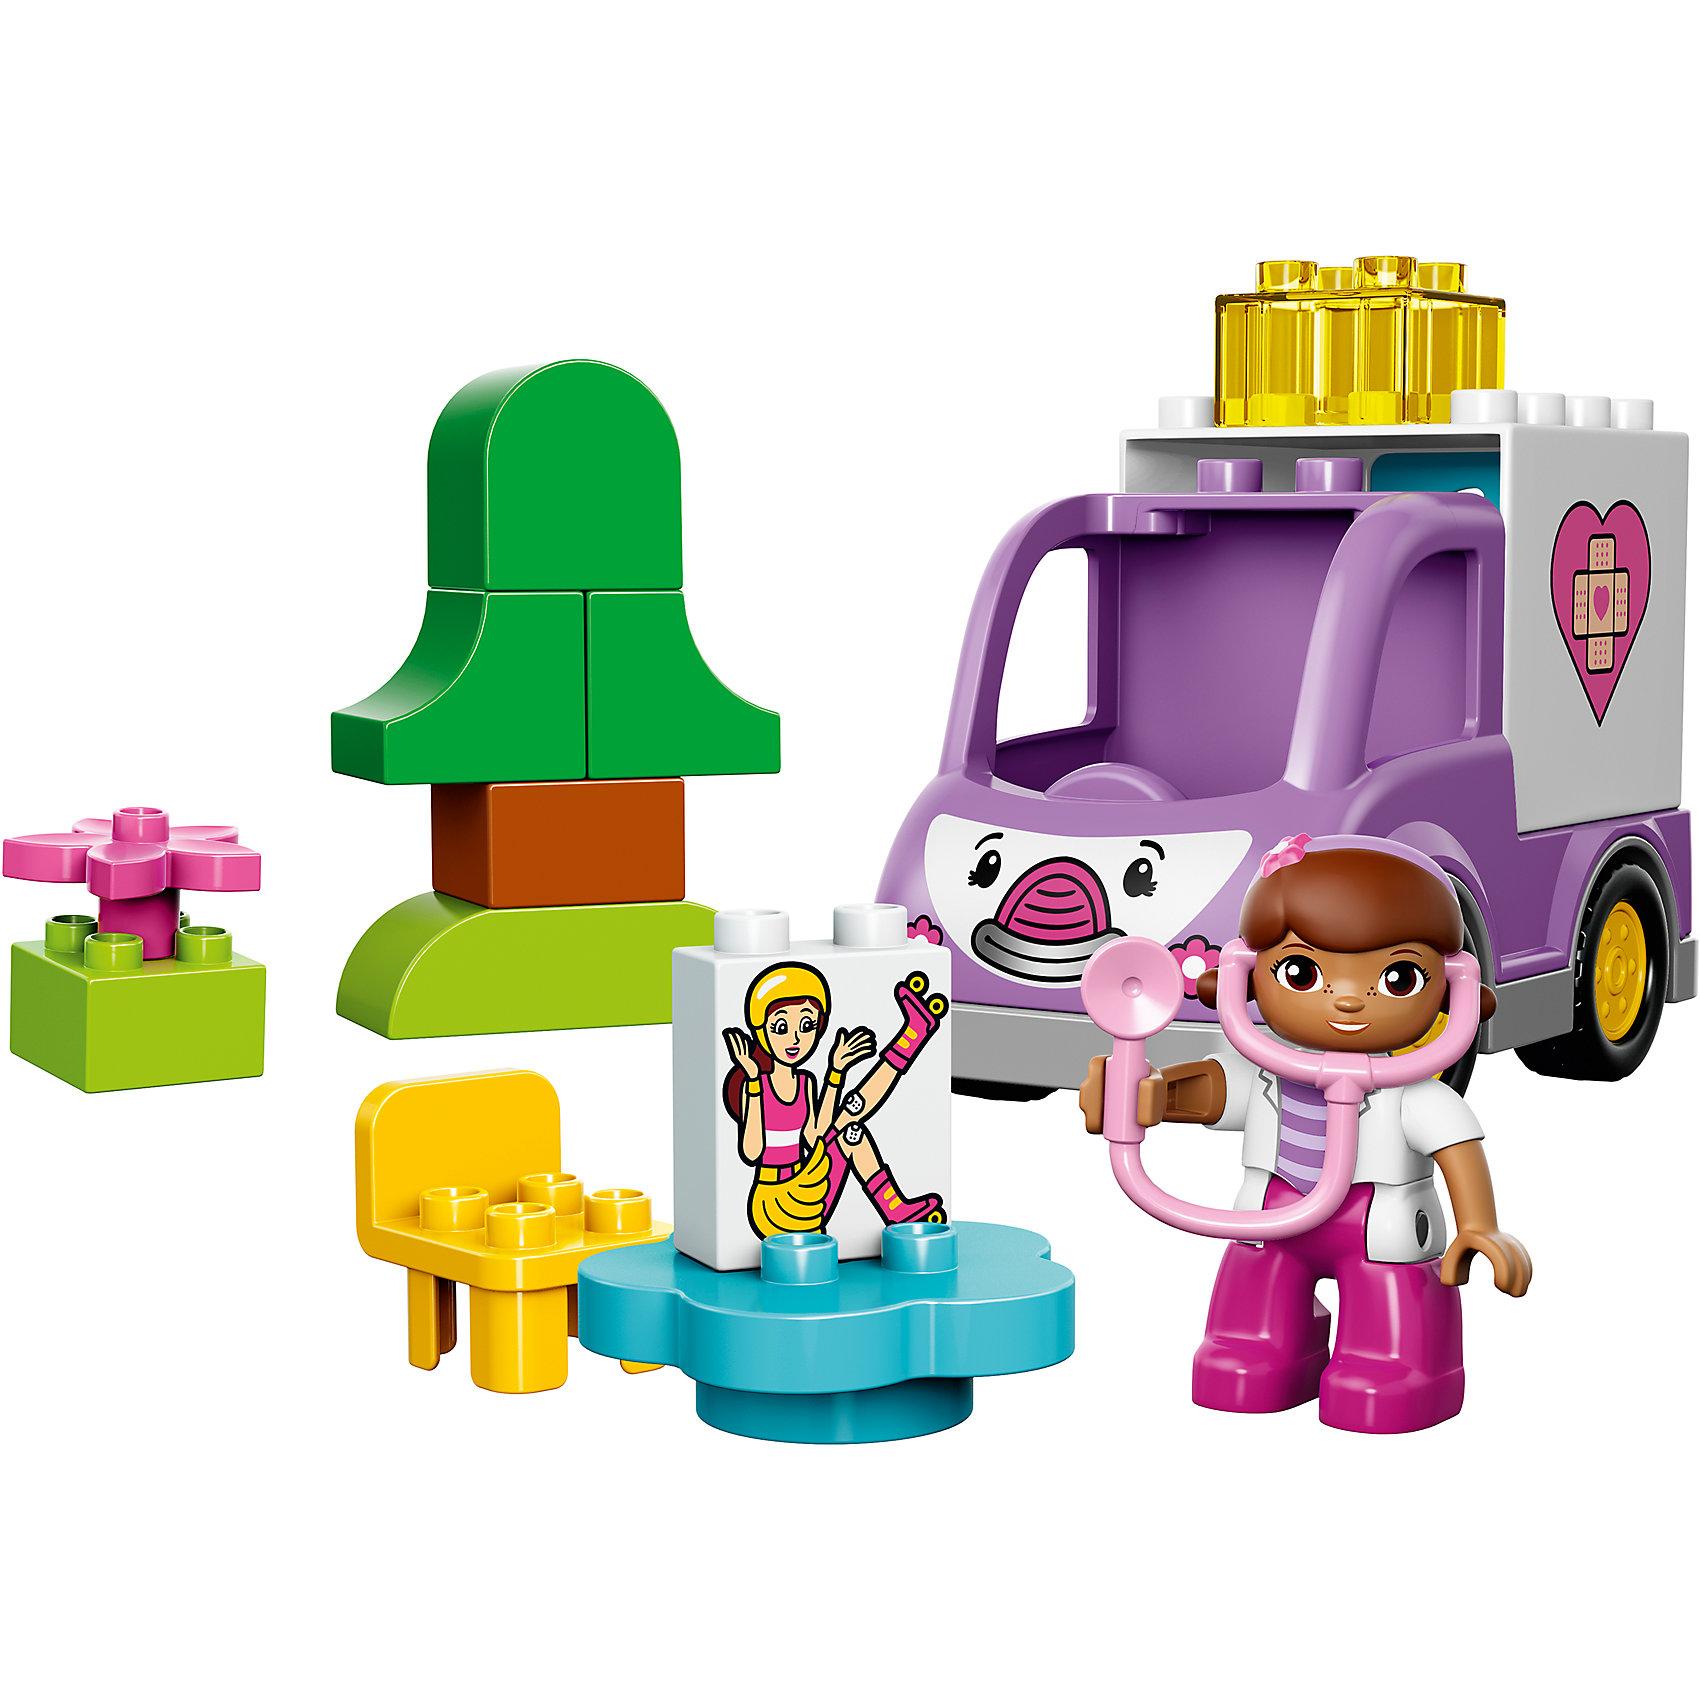 LEGO DUPLO 10605: ������ ������ ������� ��������